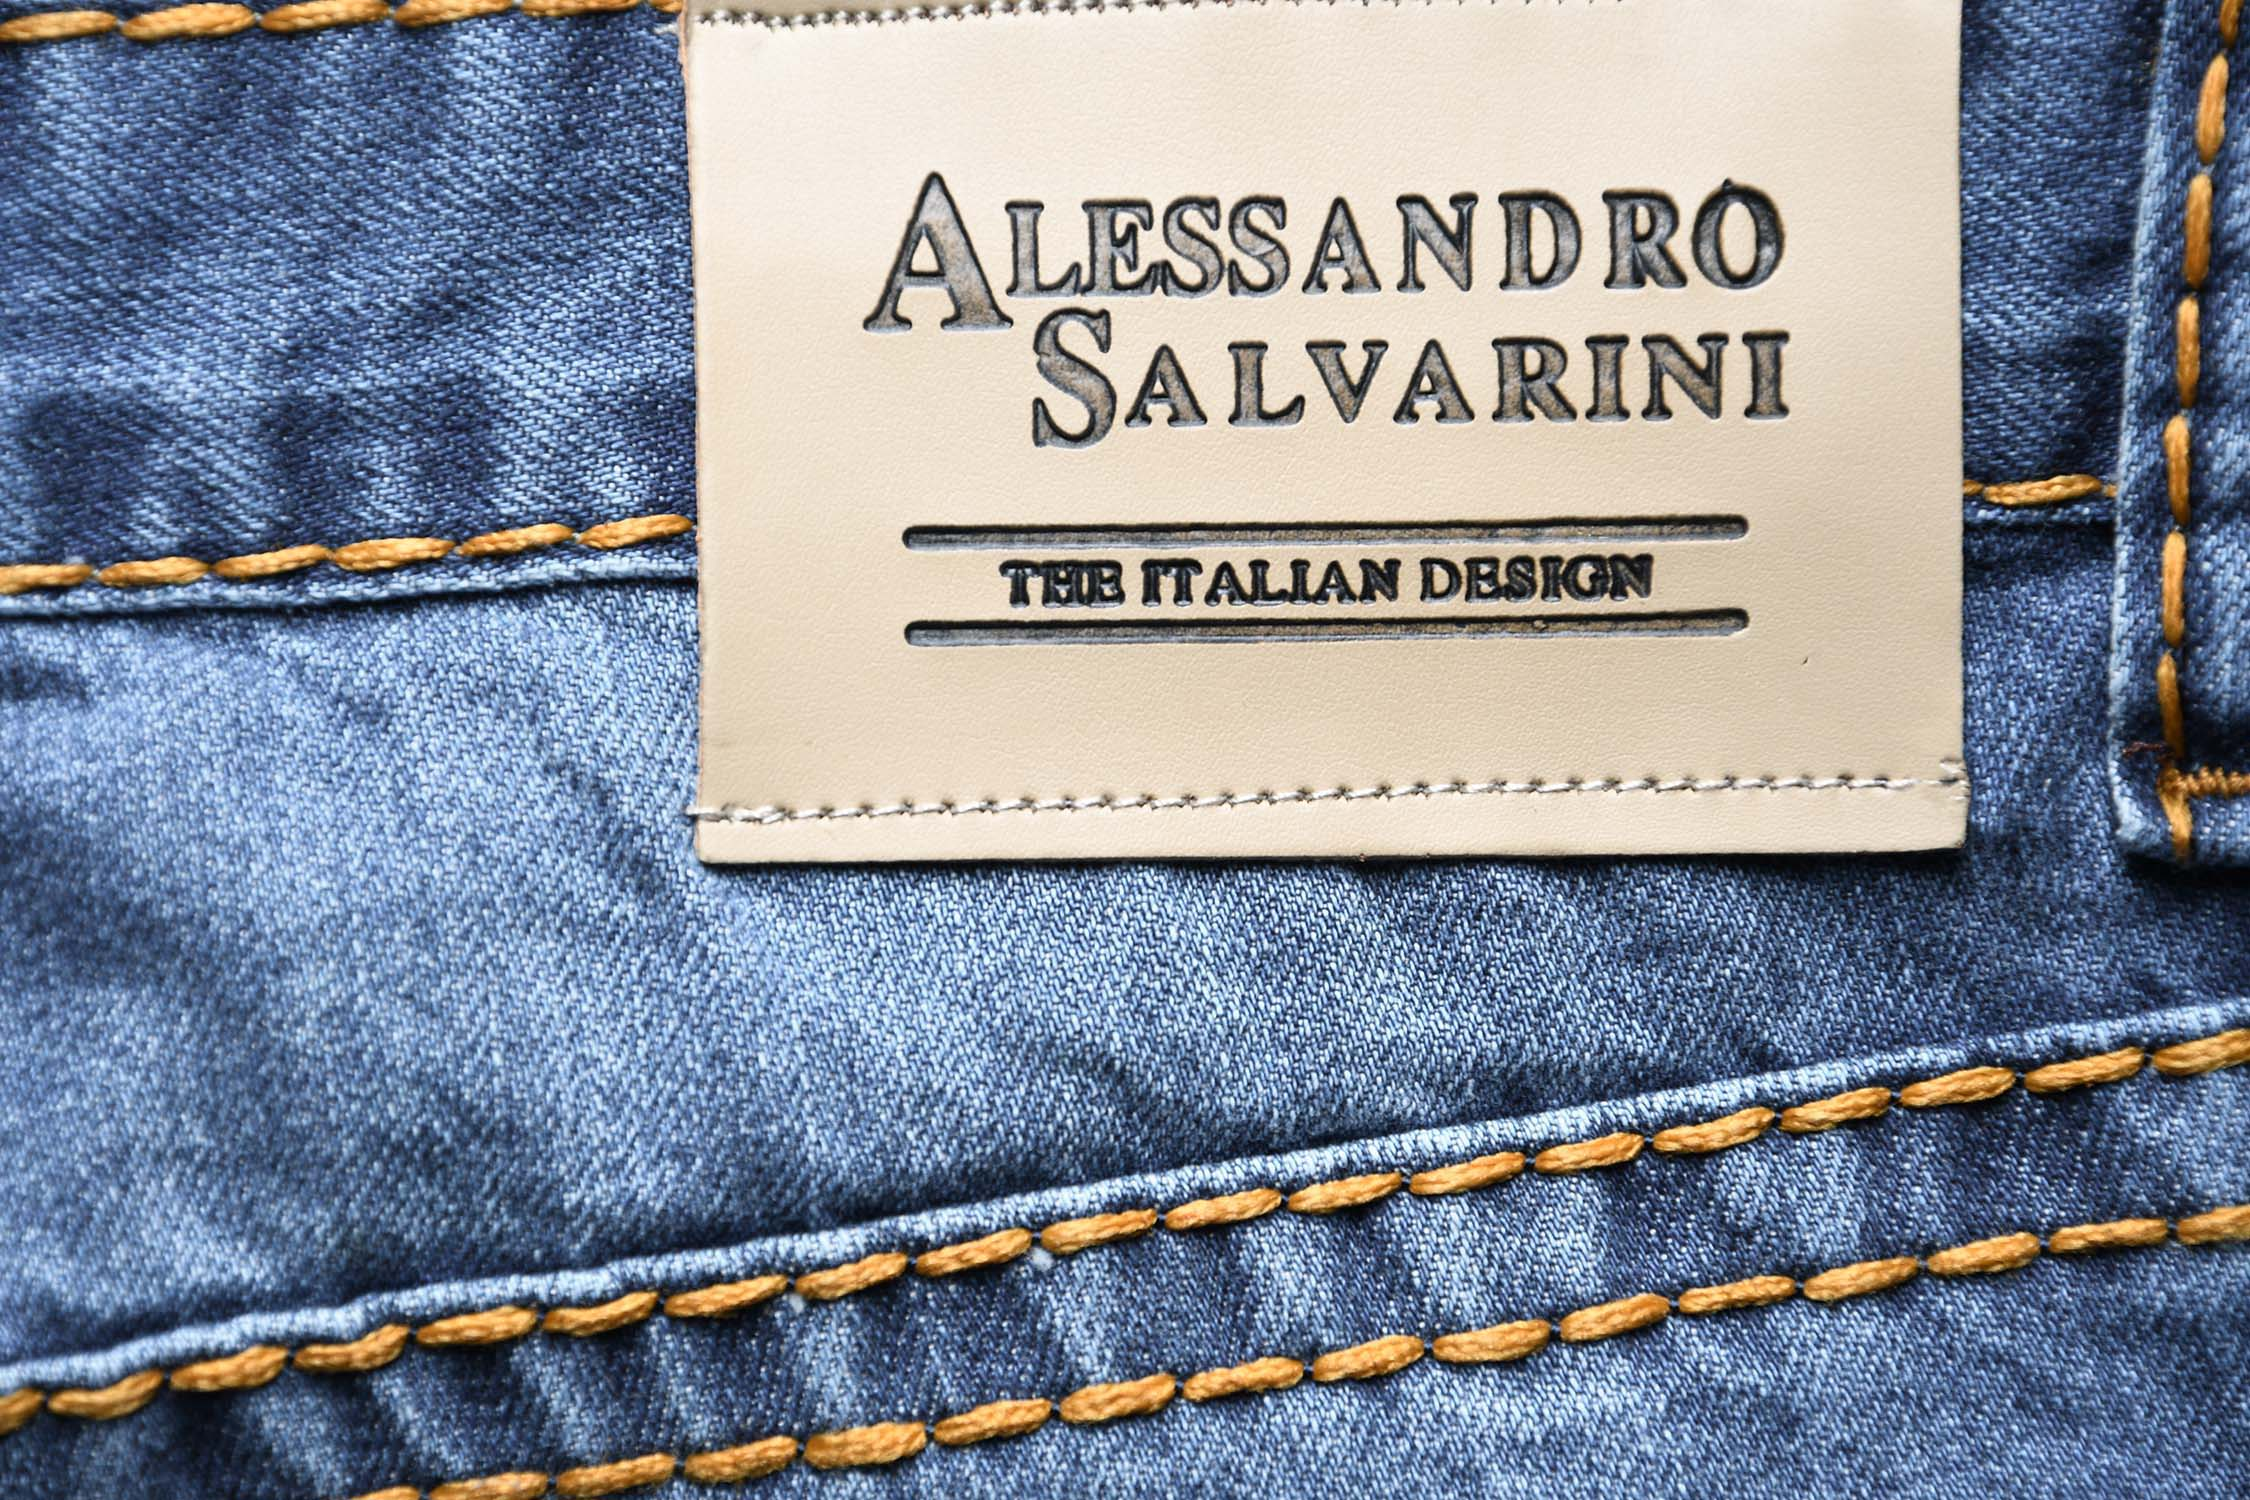 A-Salvarini-Herren-Jeans-Hose-dicke-Naehte-Jeanshose-Comfort-Fit-gerades-Bein Indexbild 17